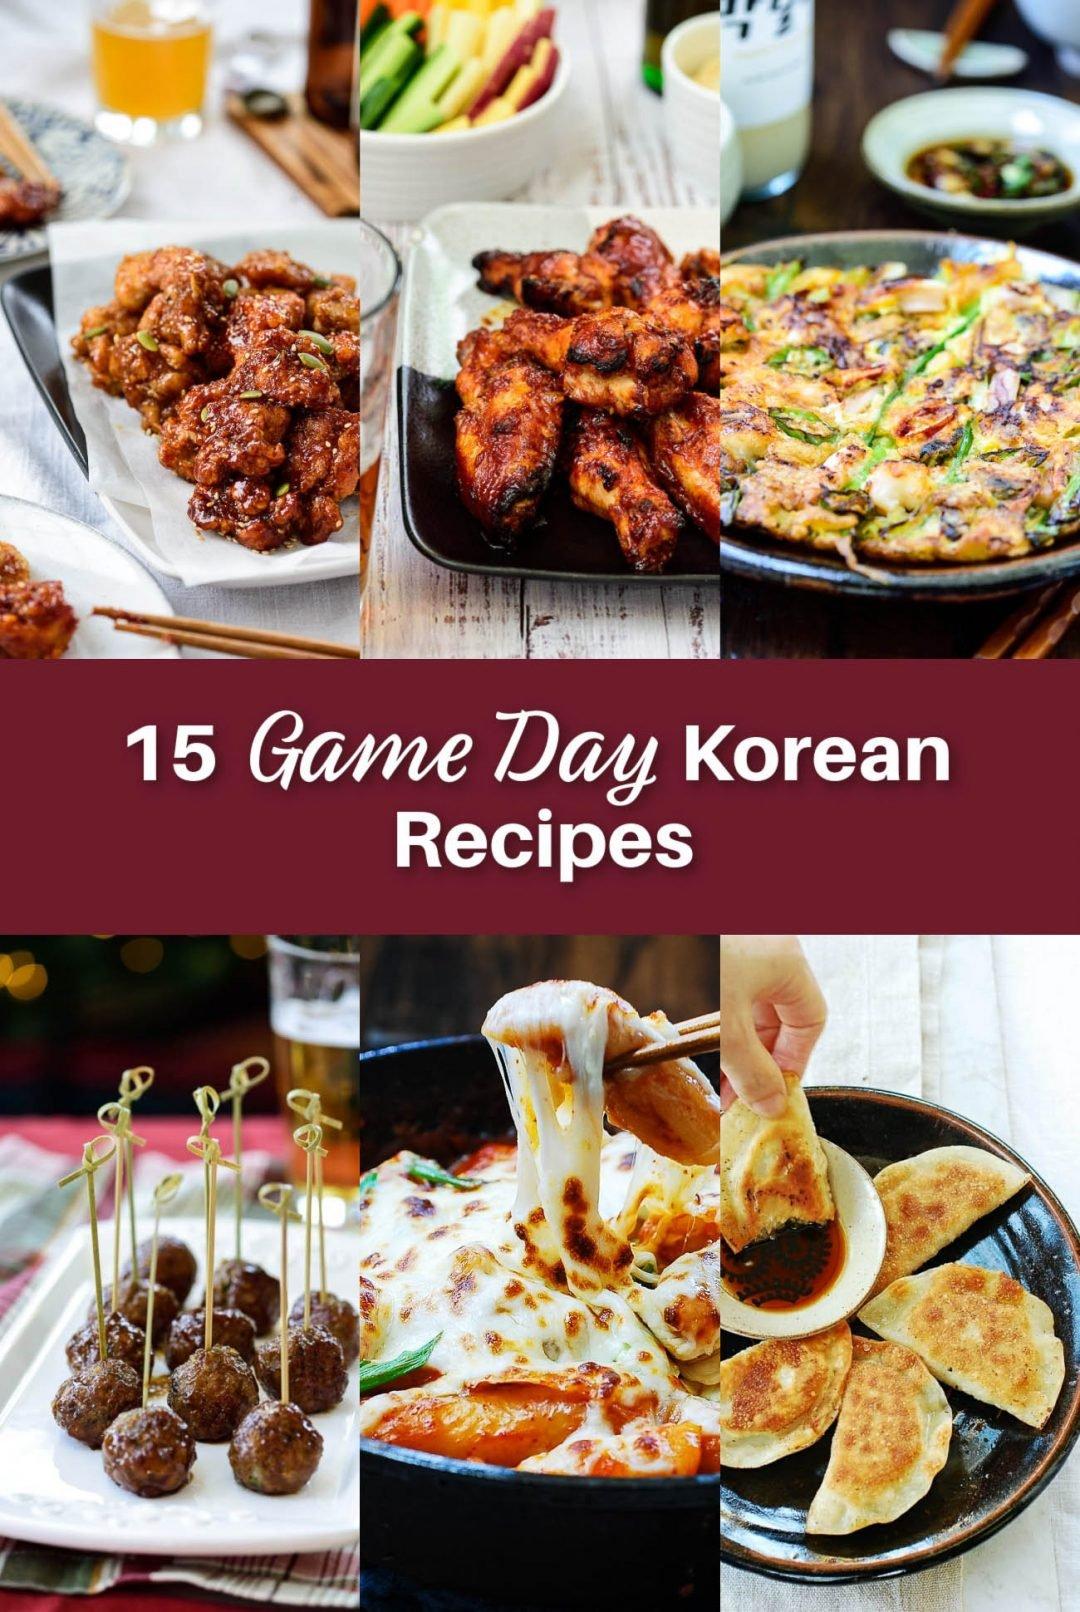 Blank 1300 x 1940 2 e1612750214383 - 15 Game Day Korean Recipes